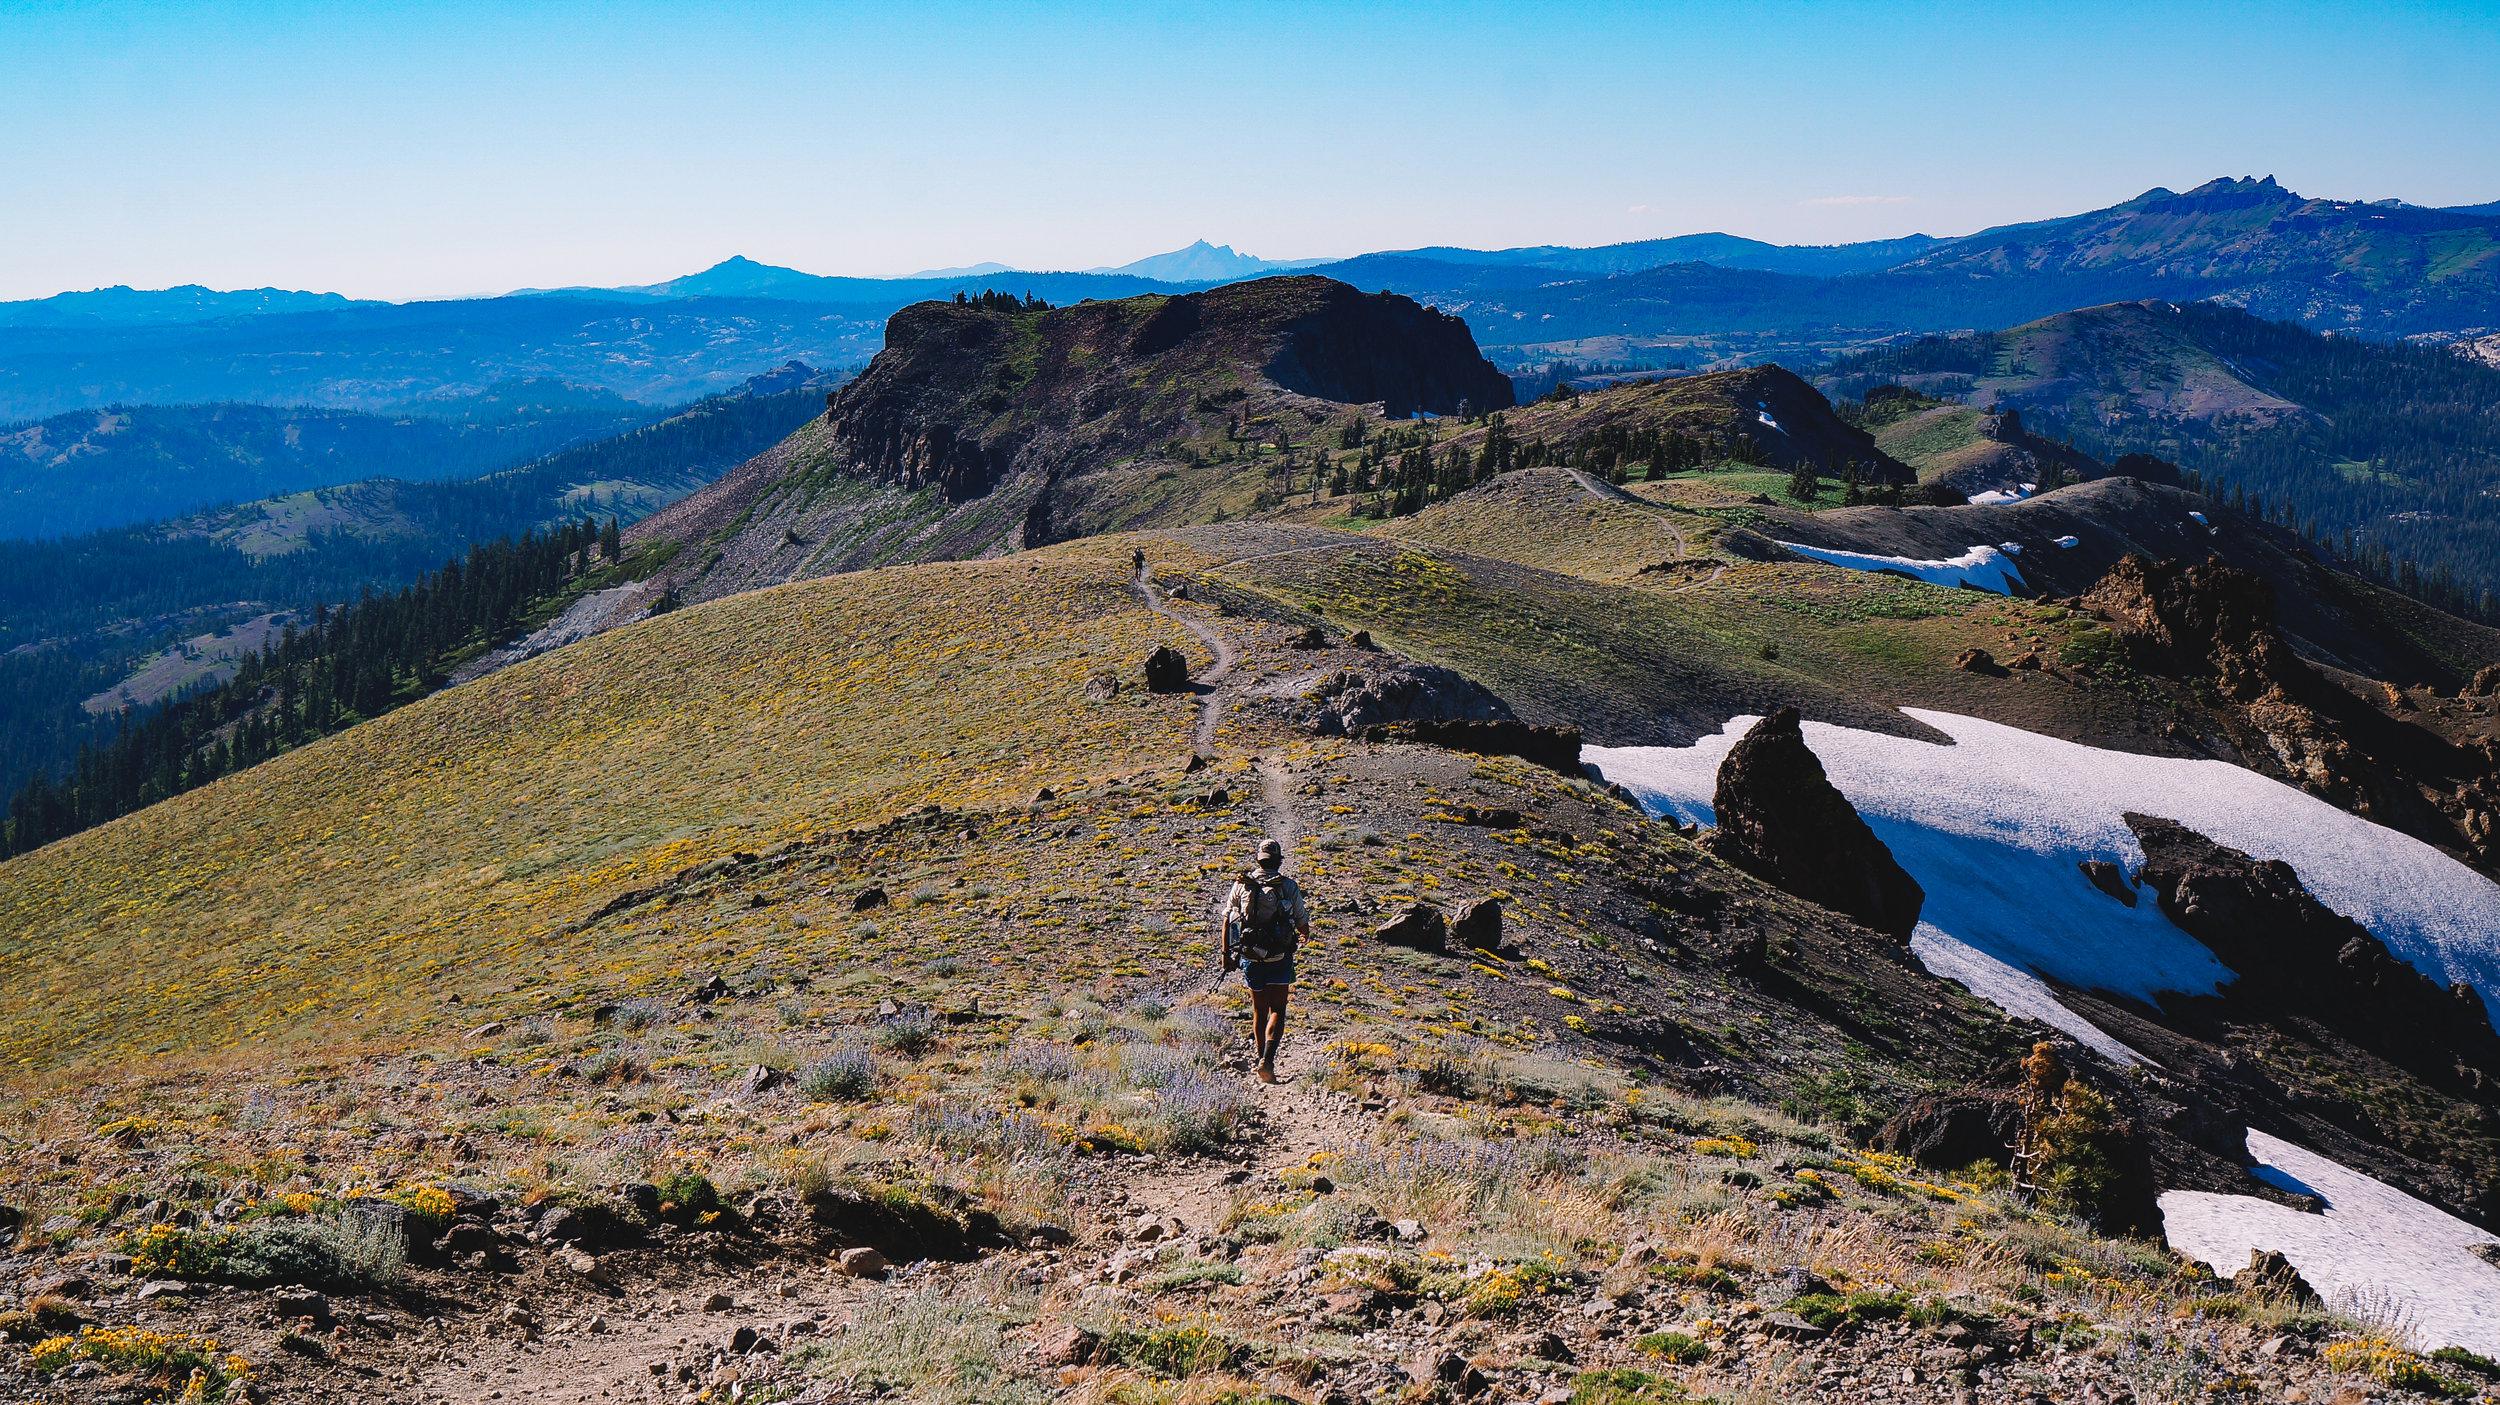 Pacific Crest Trail -